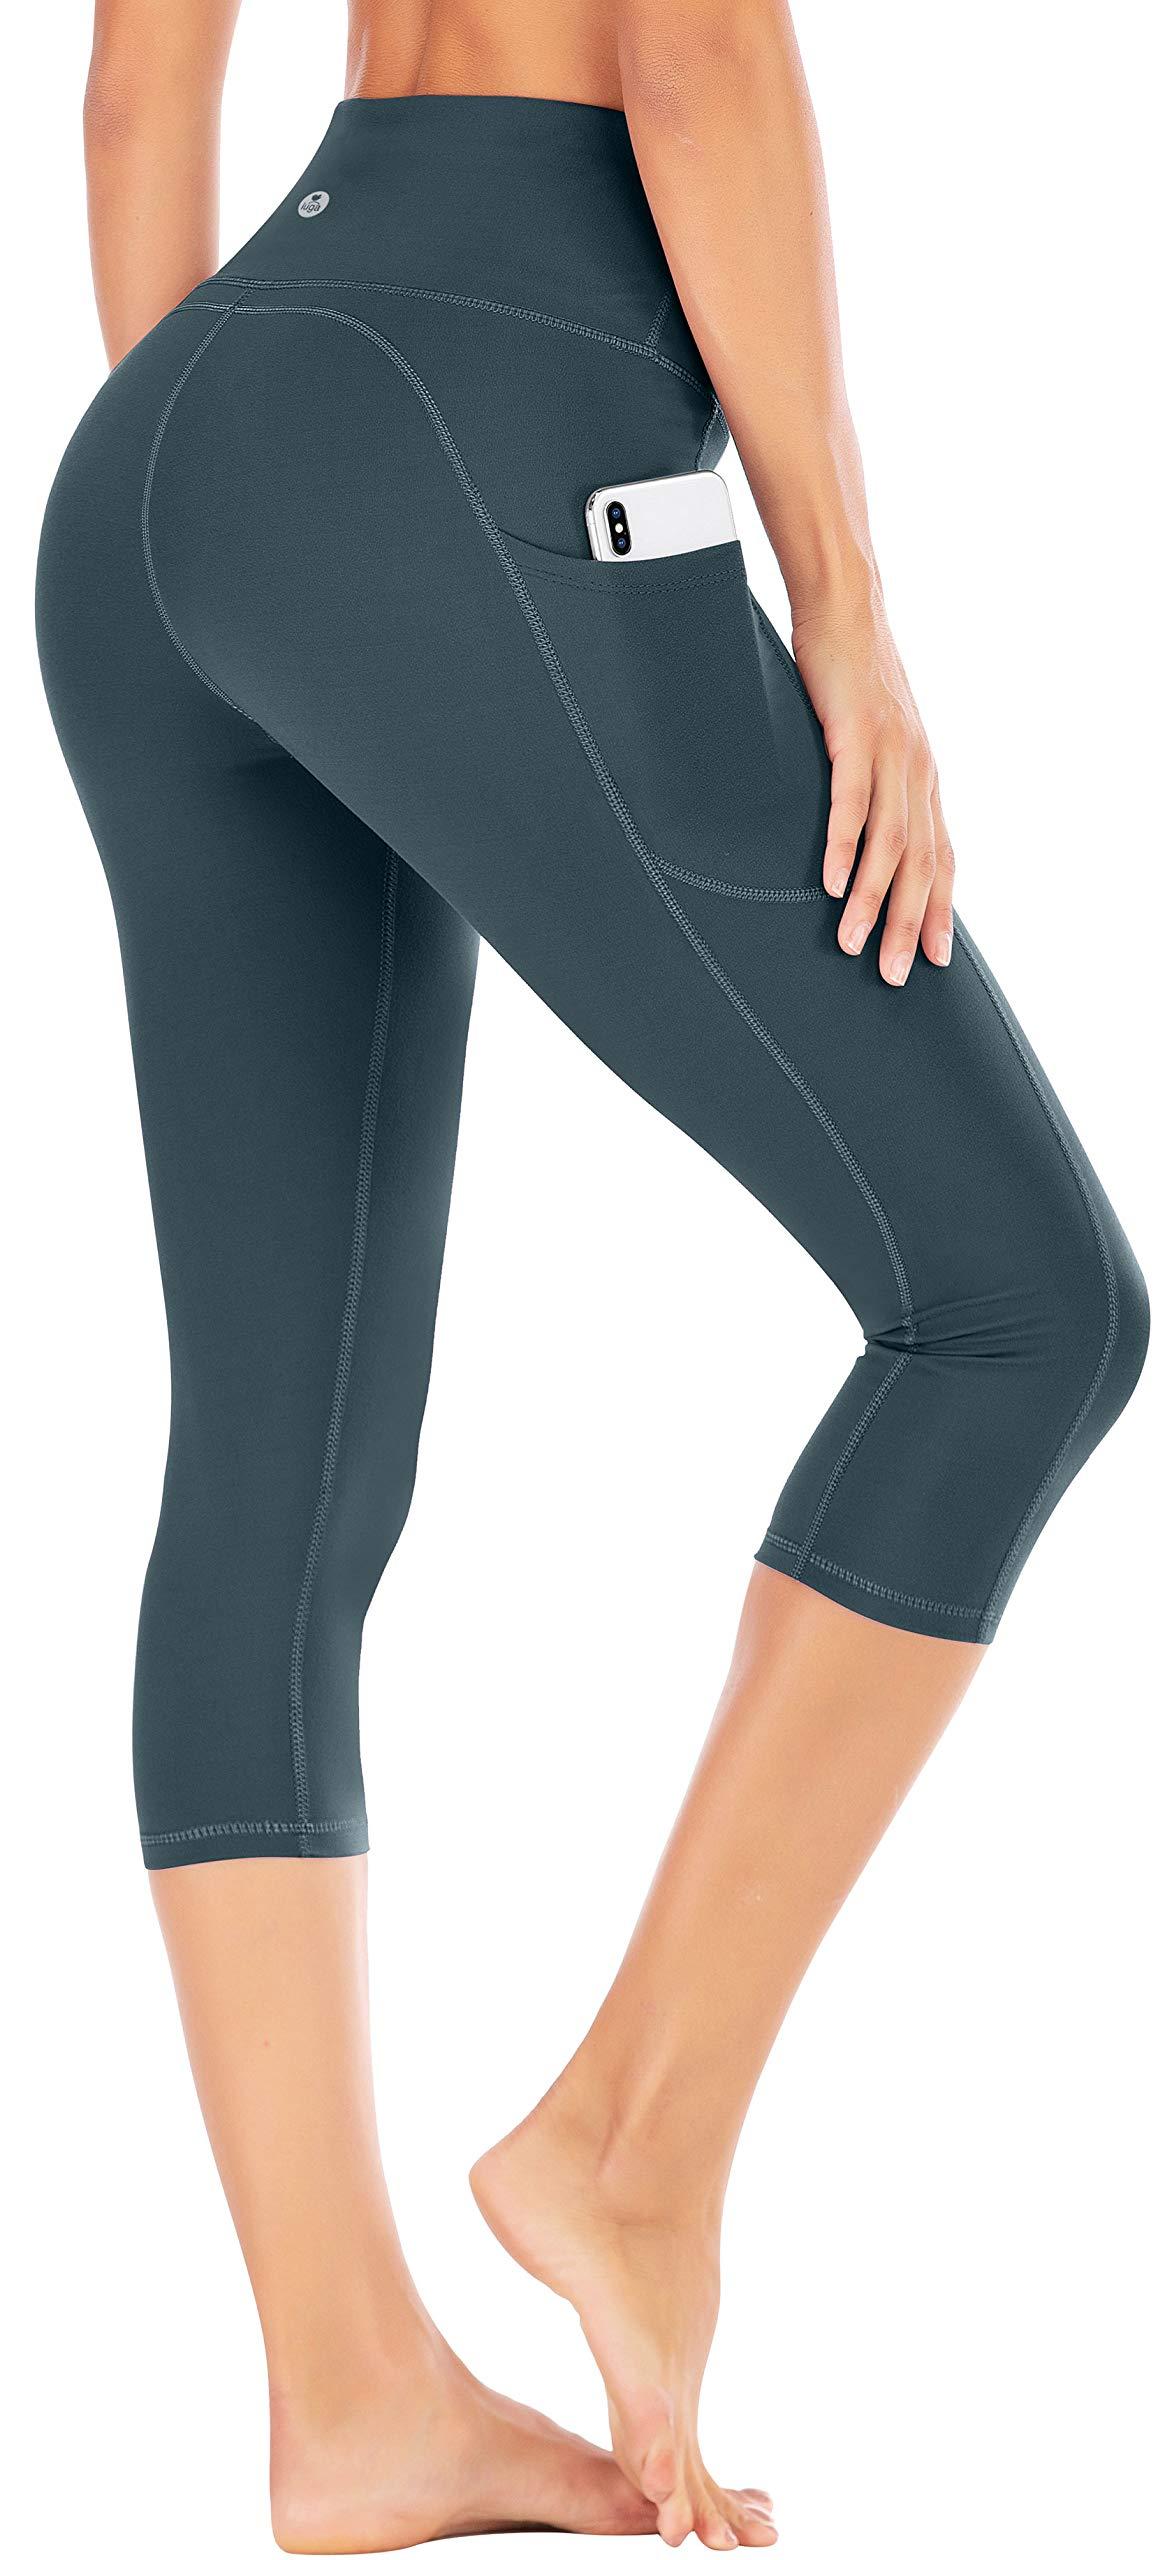 IUGA High Waist Yoga Pants with Pockets, Tummy Control Yoga Capris for Women, 4 Way Stretch Capri Leggings with Pockets(Dark Green, L) by IUGA